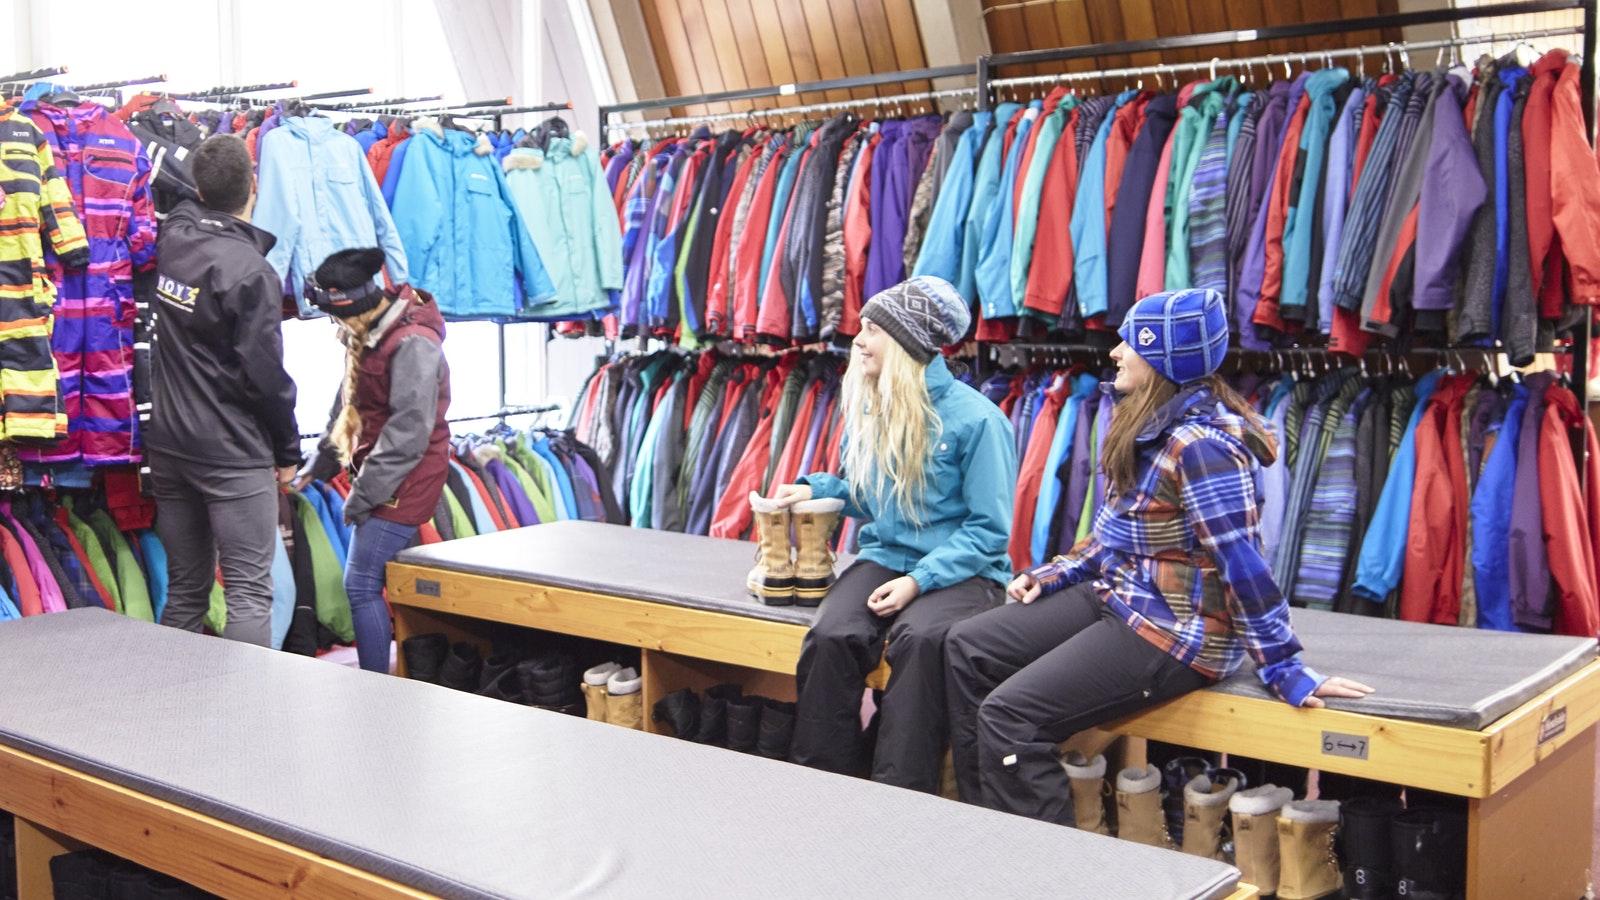 Hoys snow rental clothing